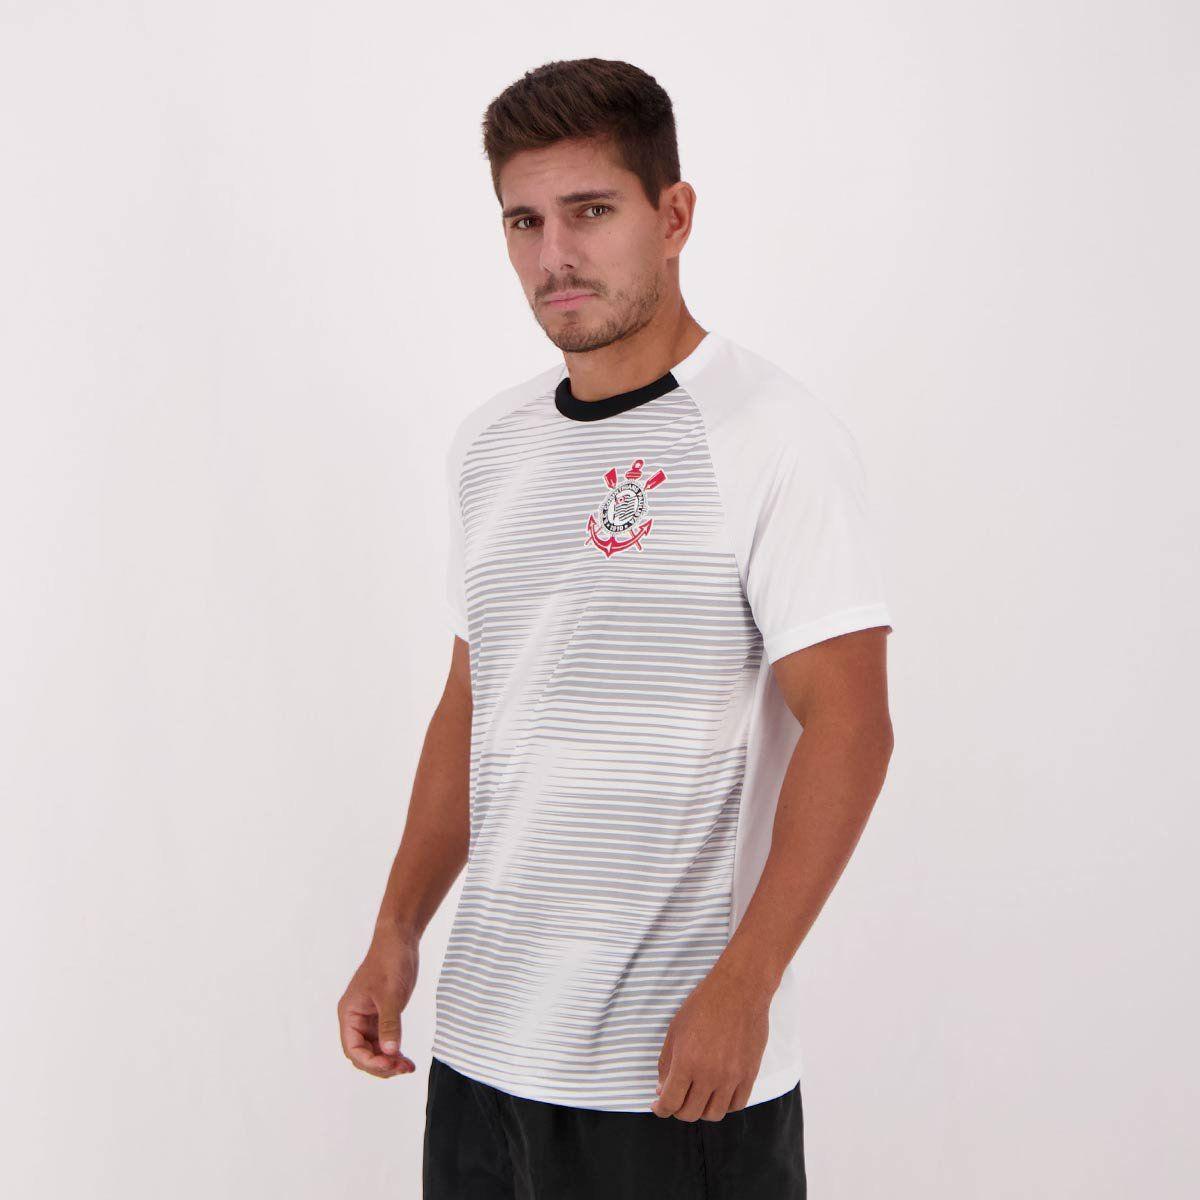 Camisa Corinthians Scrawl SPR